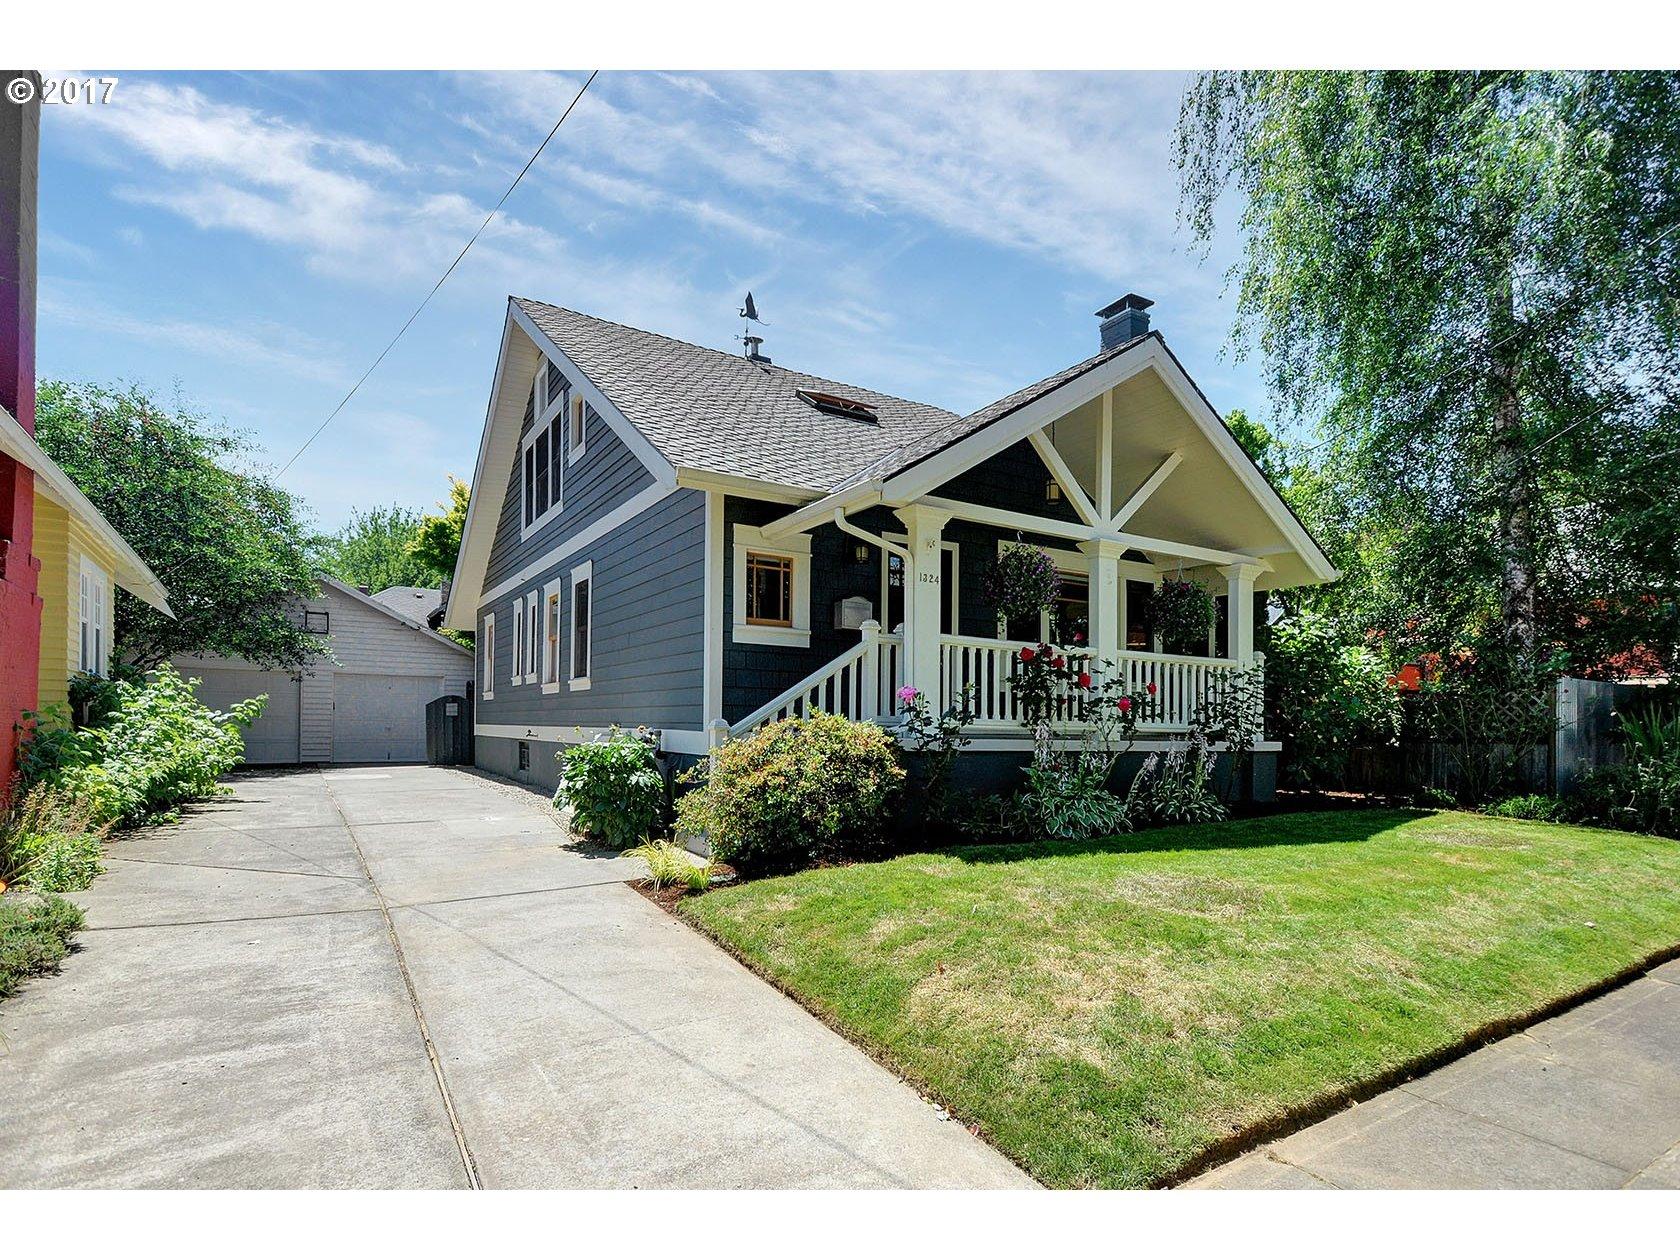 1324 SE FLAVEL ST, Portland OR 97202